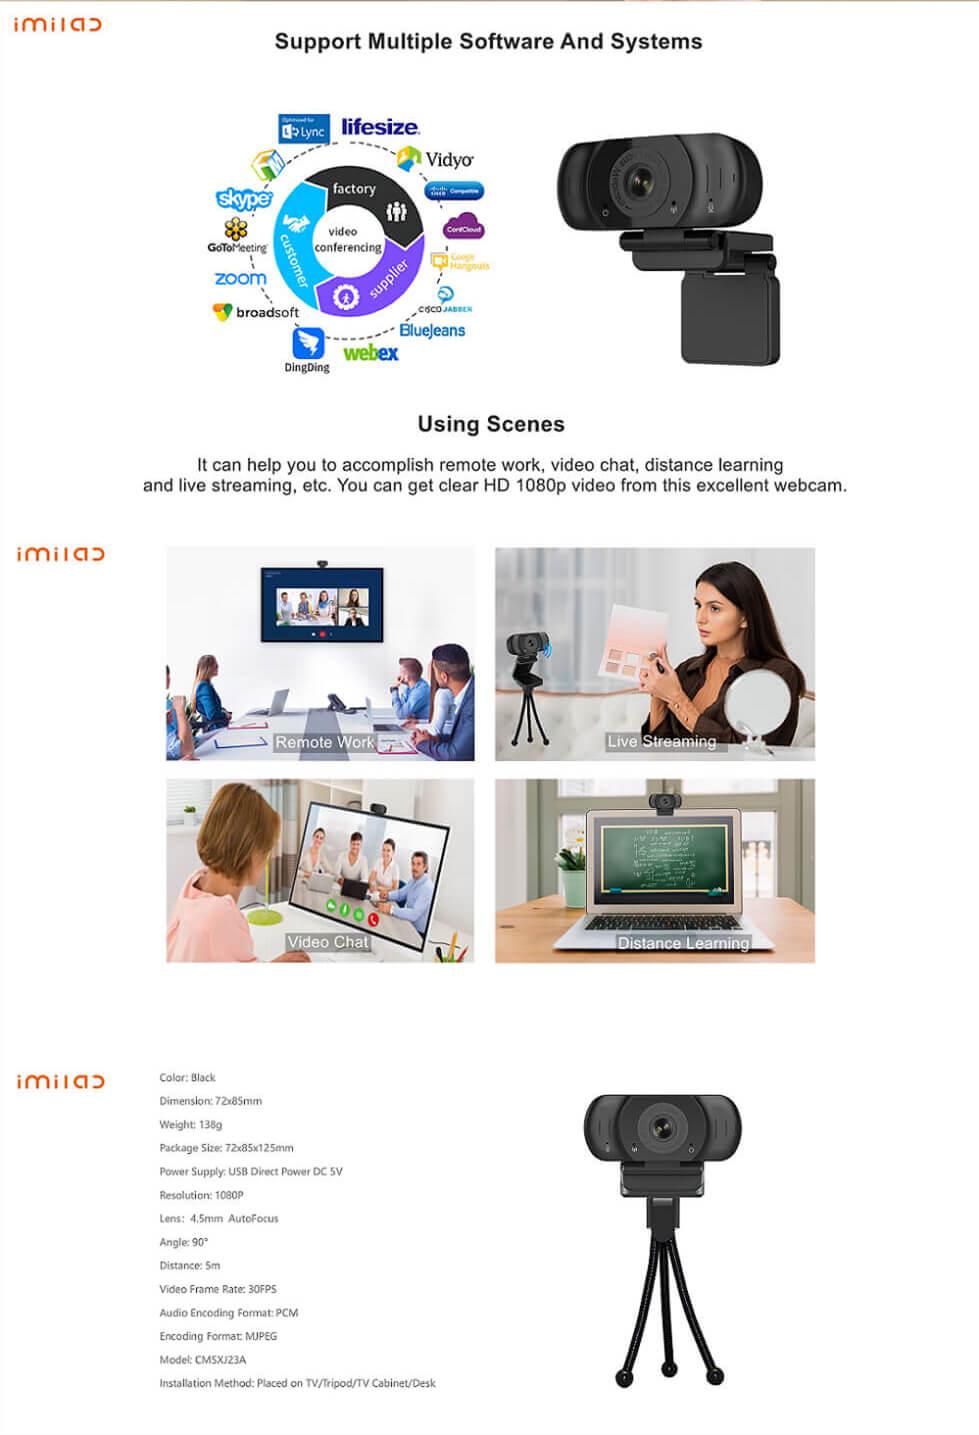 IMILAB Auto Webcam Pro W90